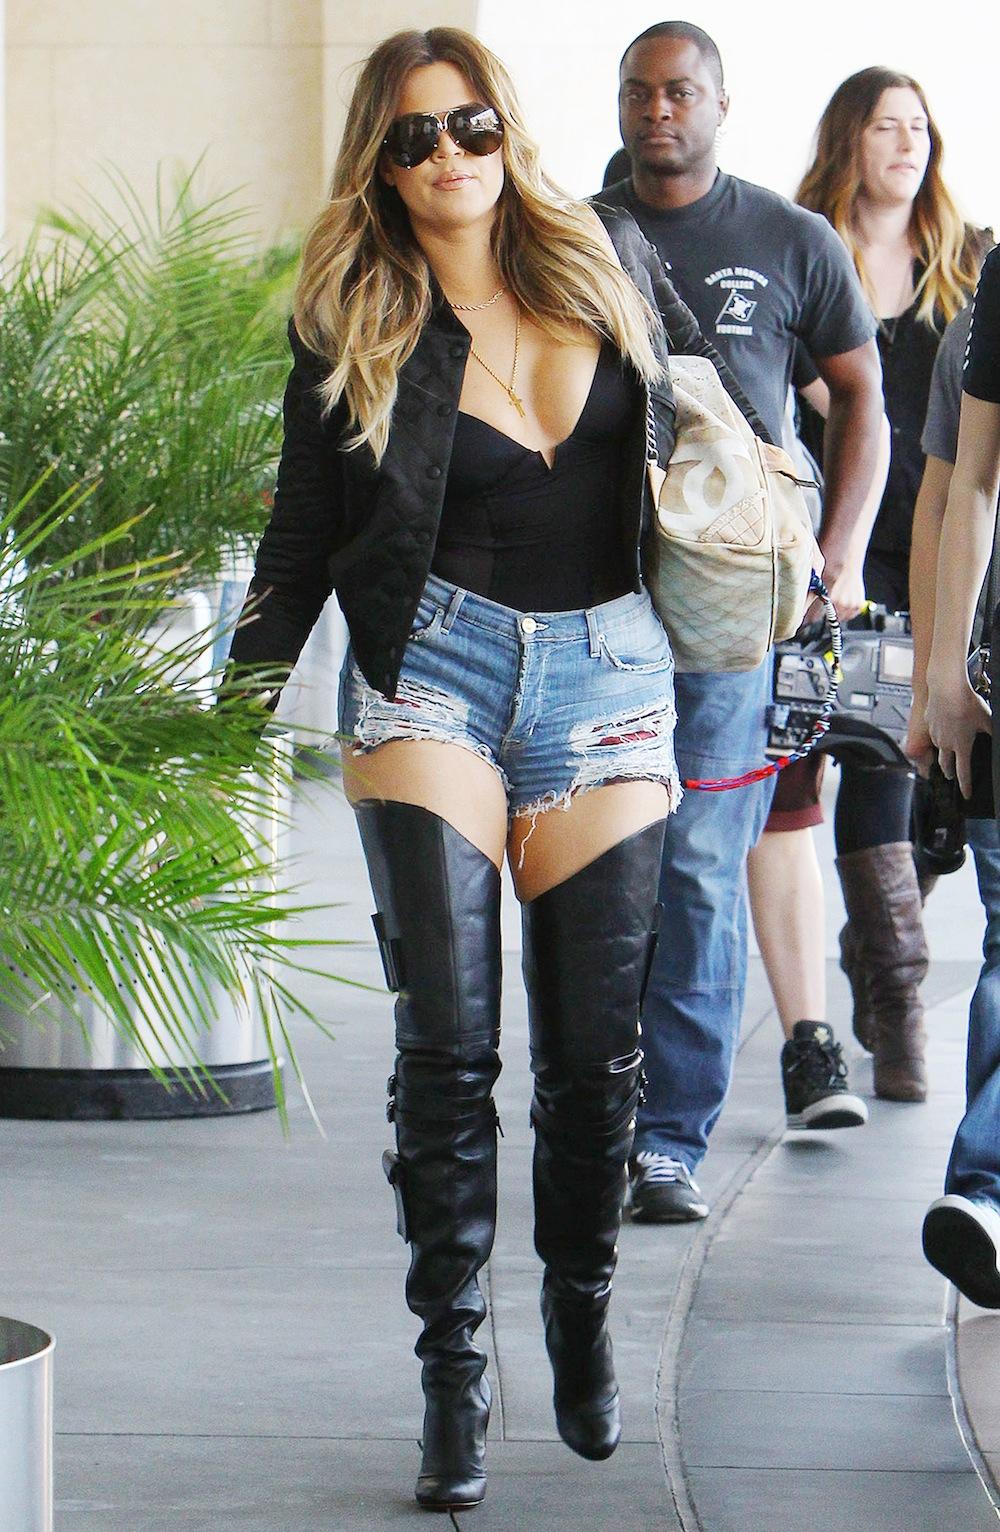 Skinny Minny! Khloé Kardashian Flaunts Weight Loss, Gets ...